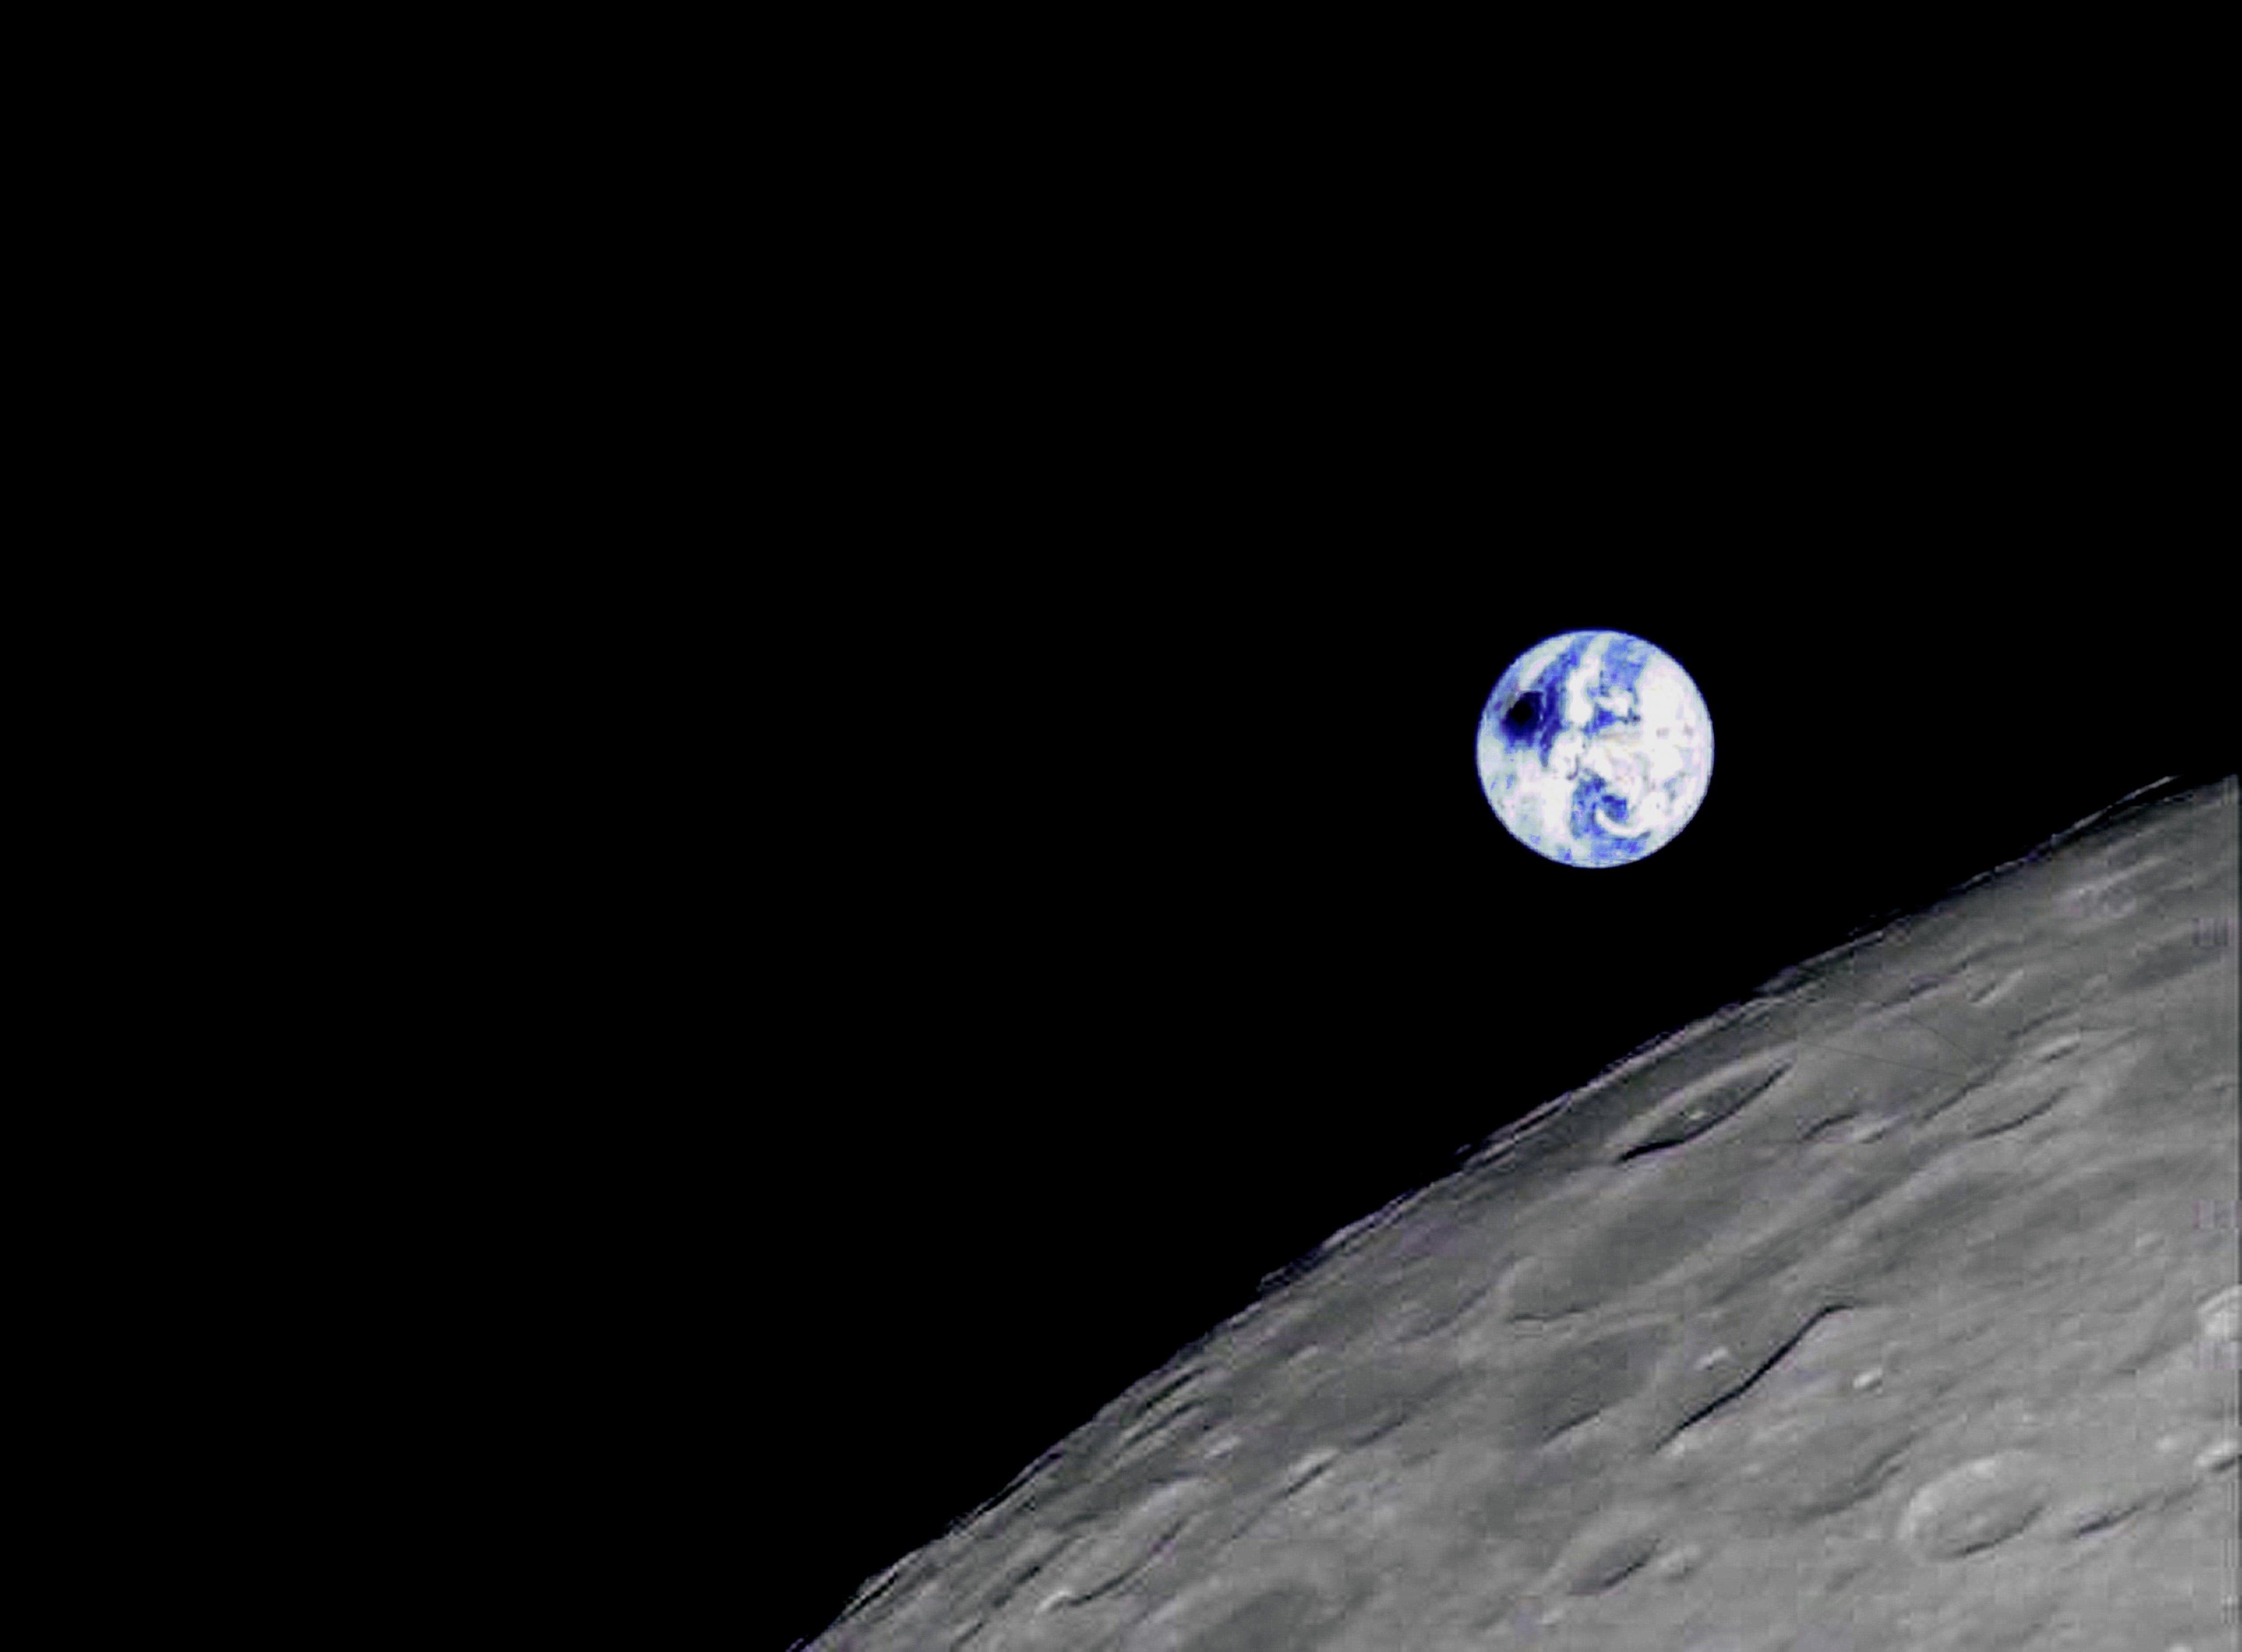 earthineclipsejune19.jpg